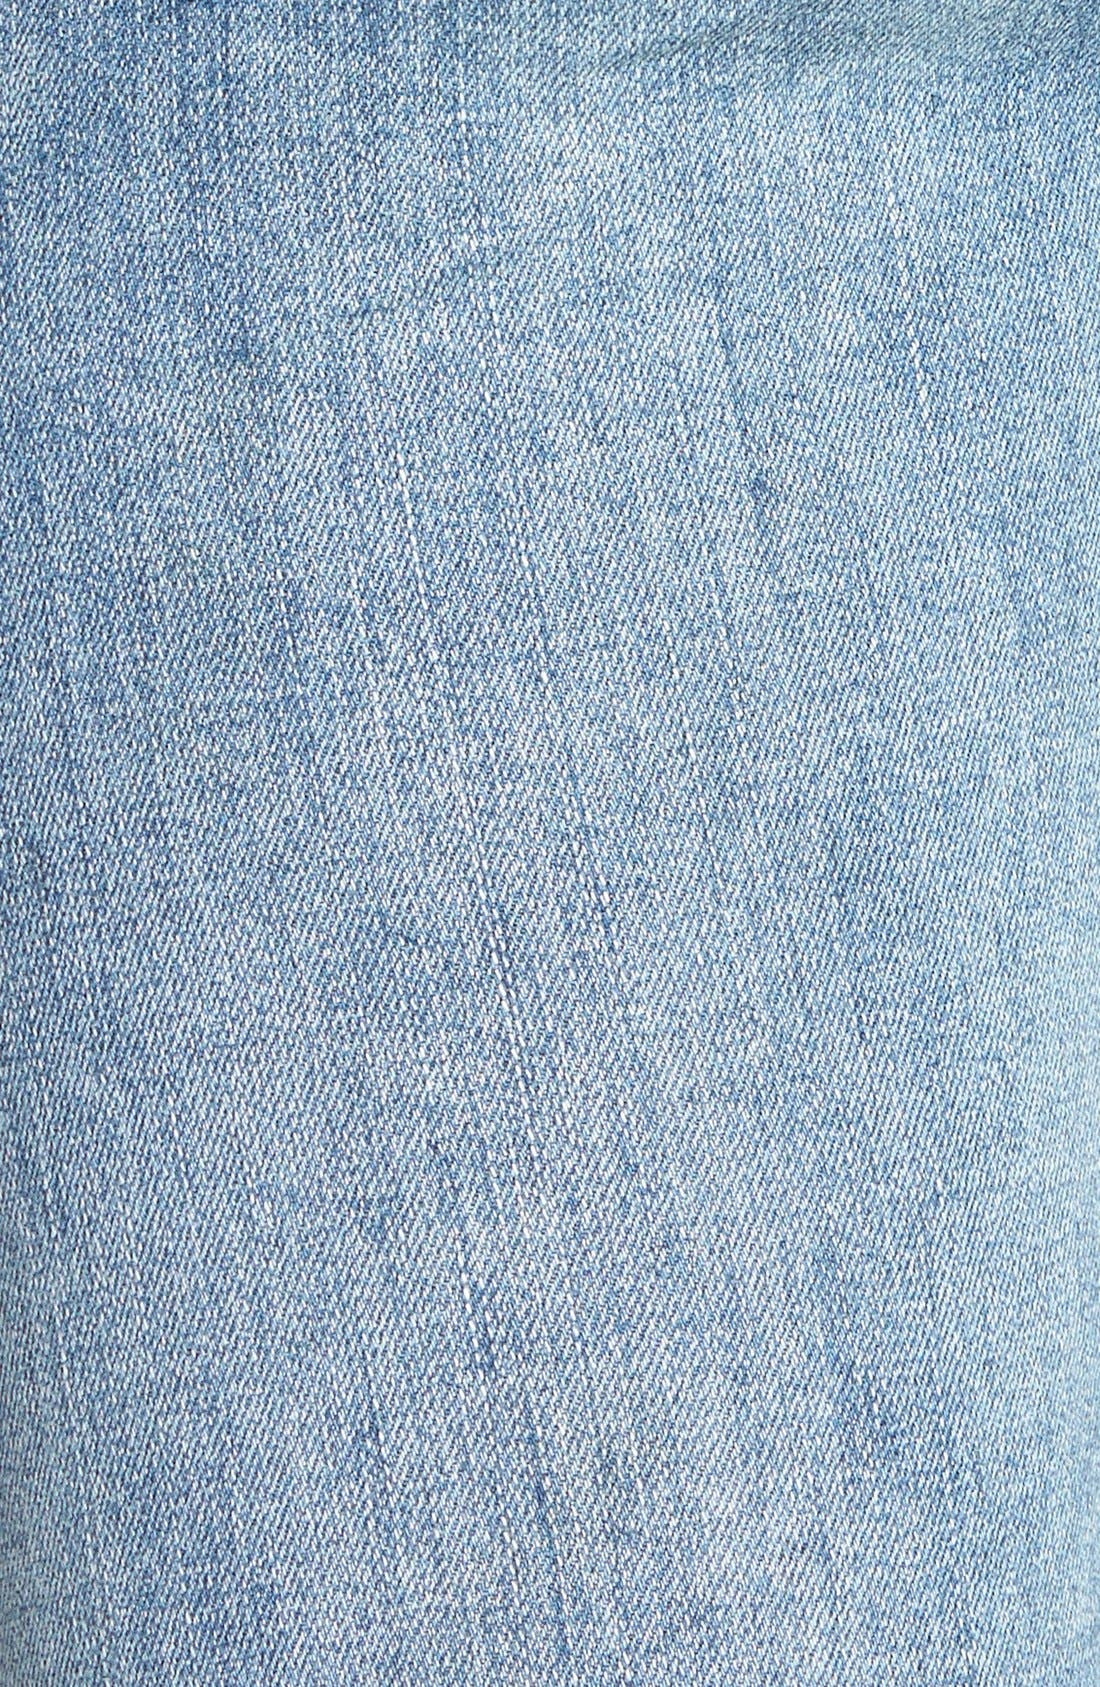 Alternate Image 3  - Free People Stretch Denim Skinny Jeans (Boston Blue)